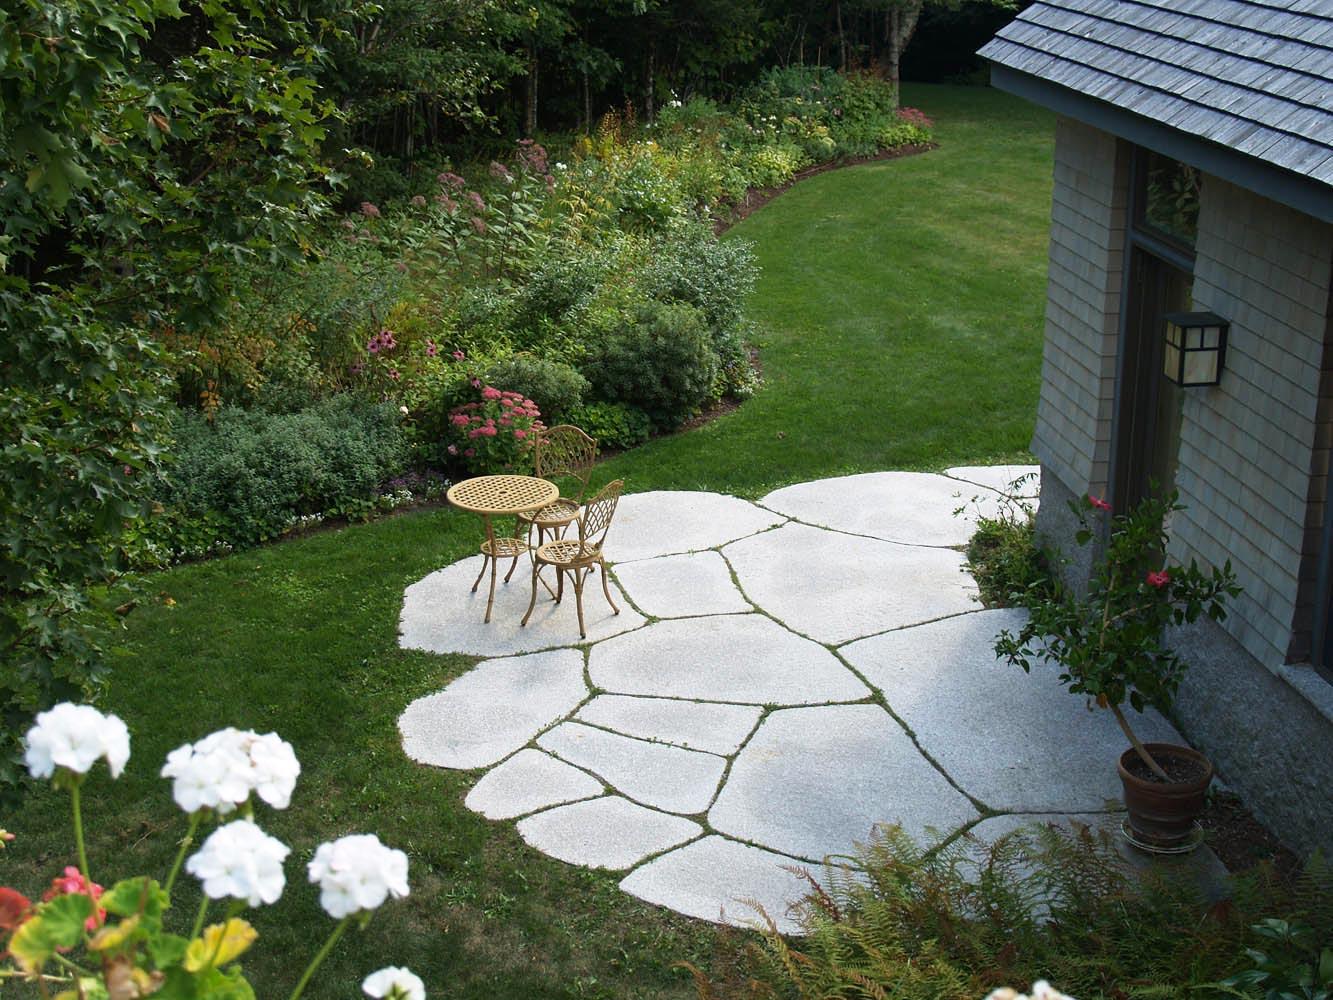 Freshwater Pearl granite irregular pavers